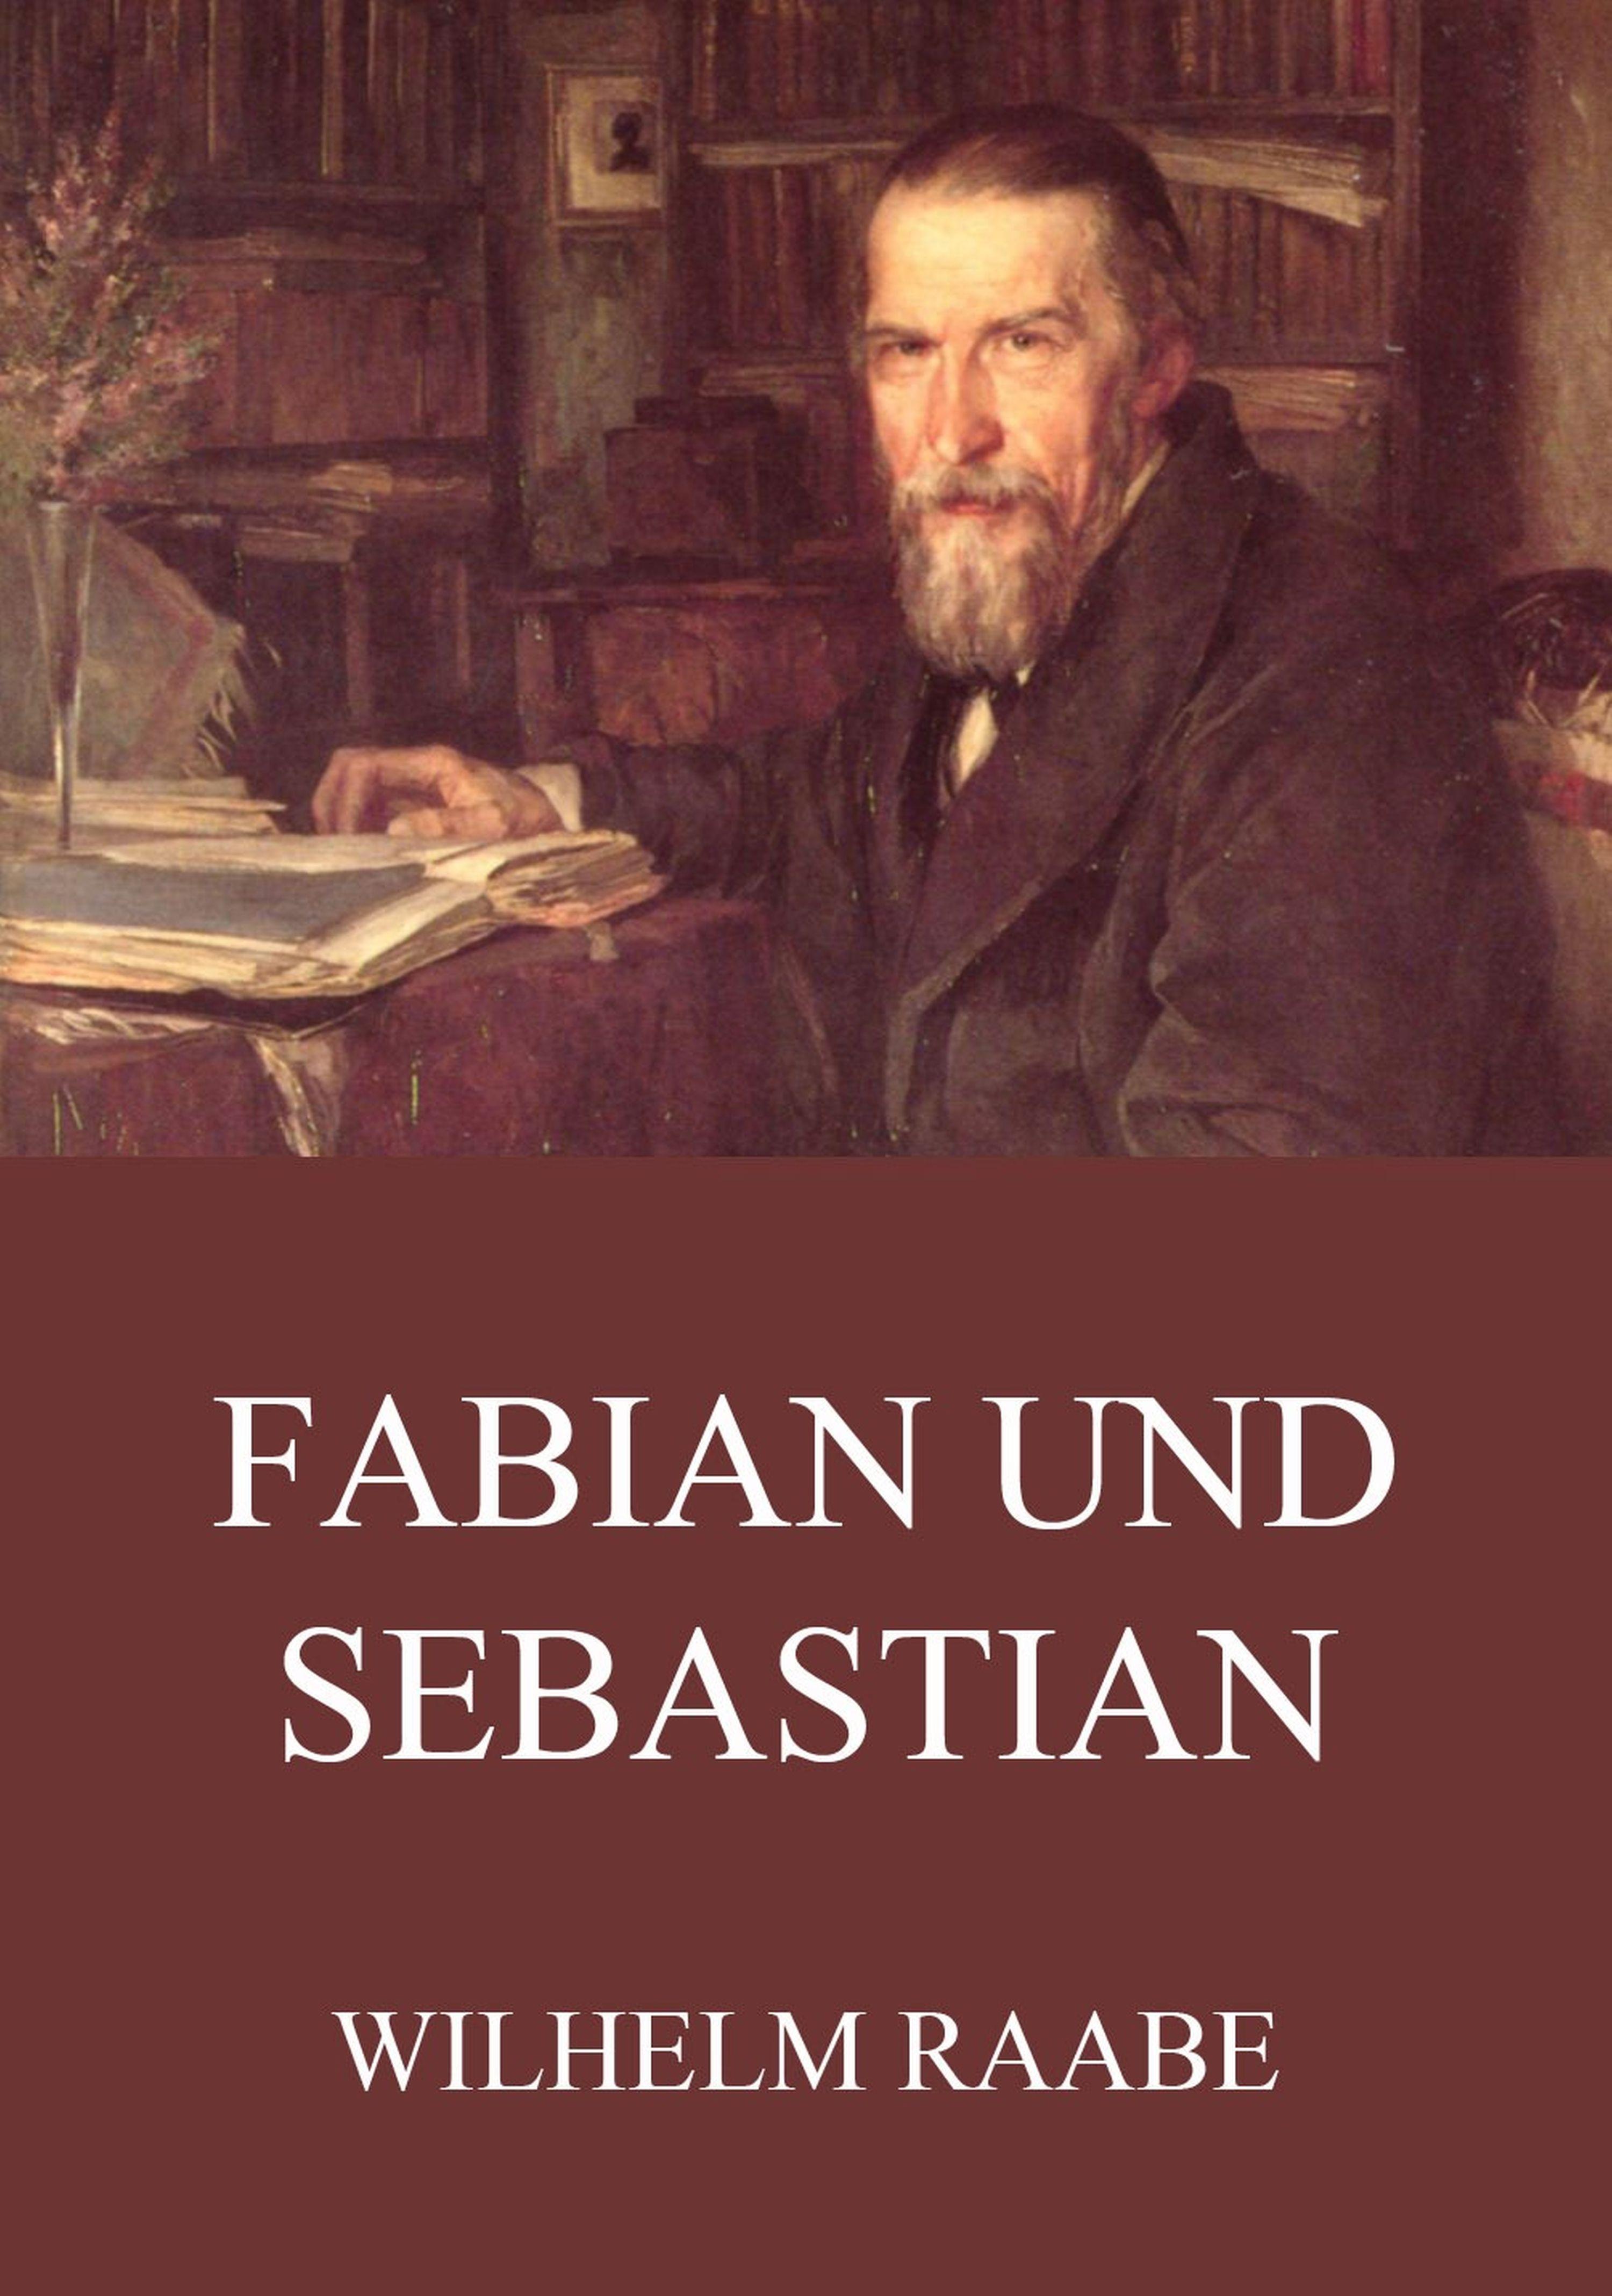 Wilhelm Raabe Fabian und Sebastian